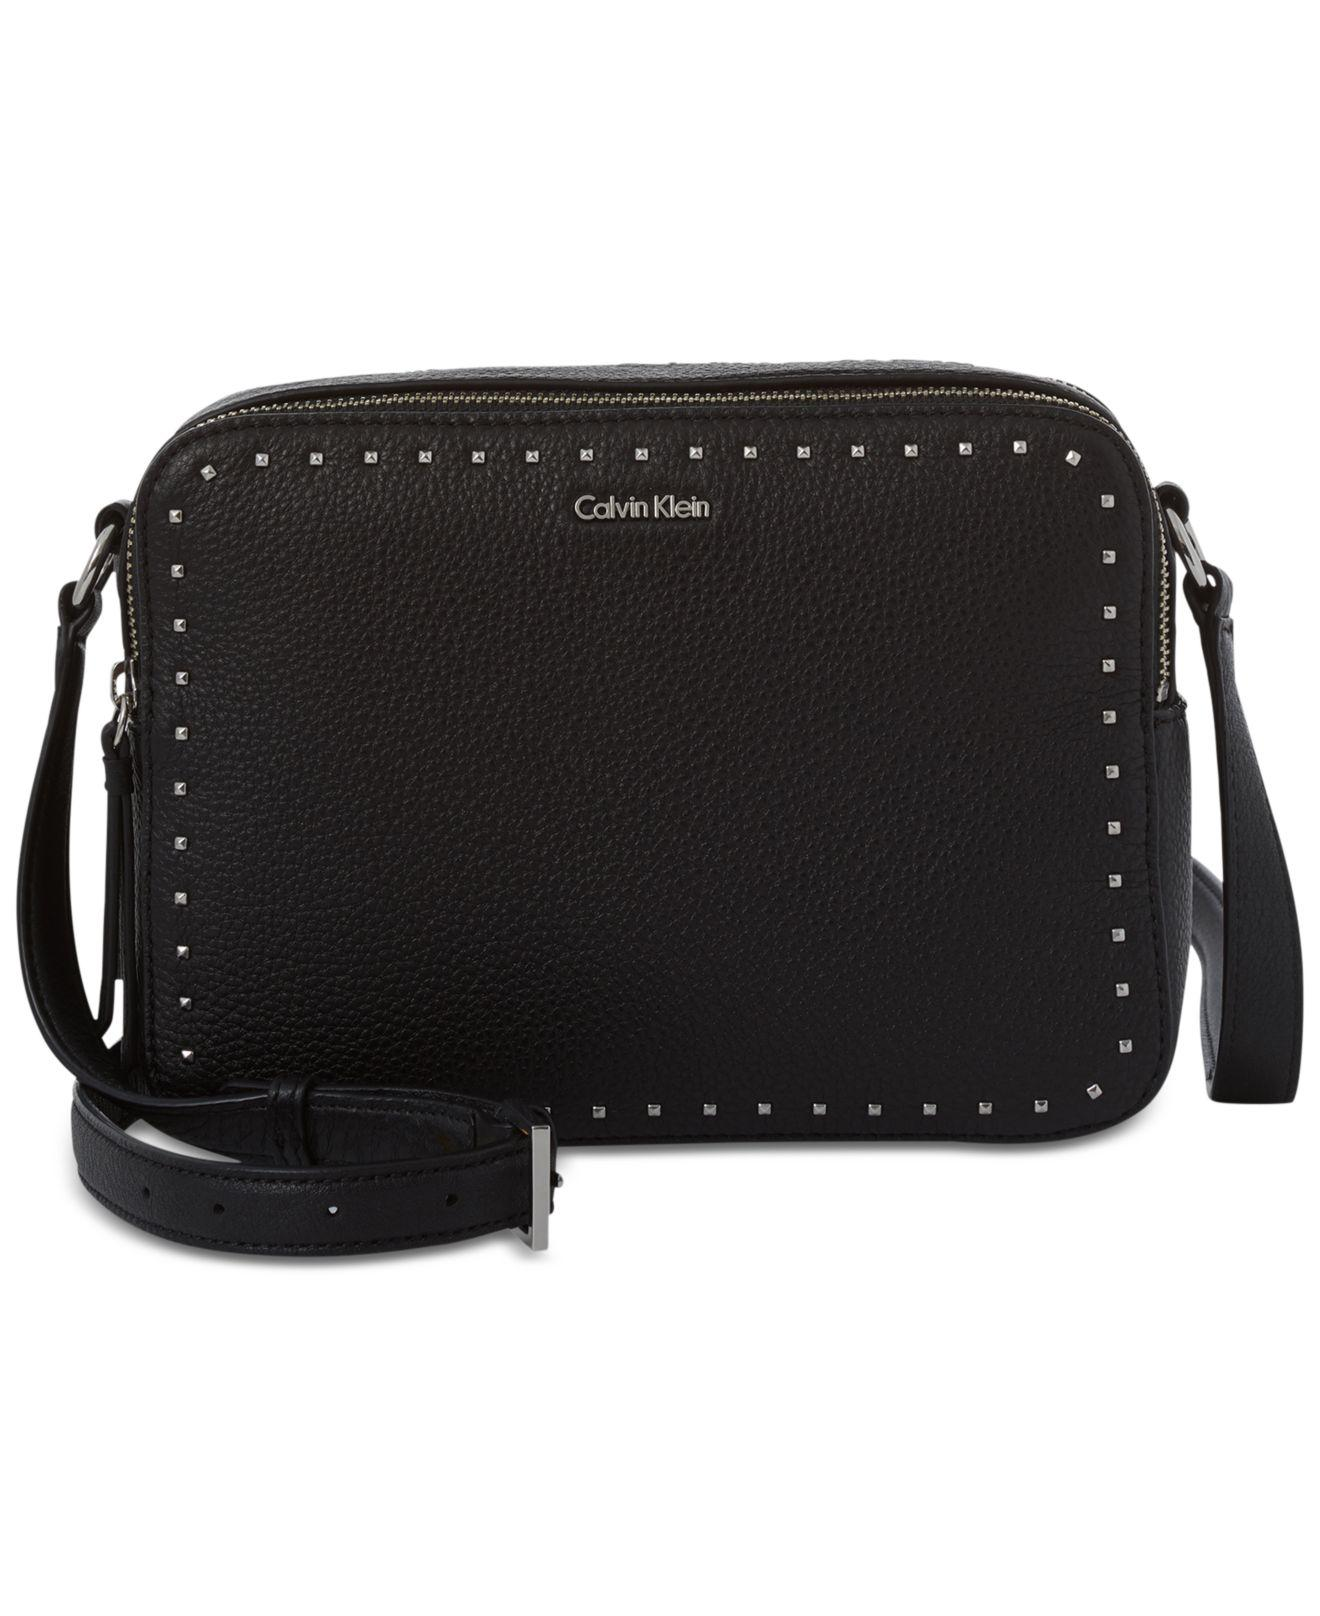 cf7fe9831d Lyst - CALVIN KLEIN 205W39NYC Avery Crossbody Camera Bag in Black